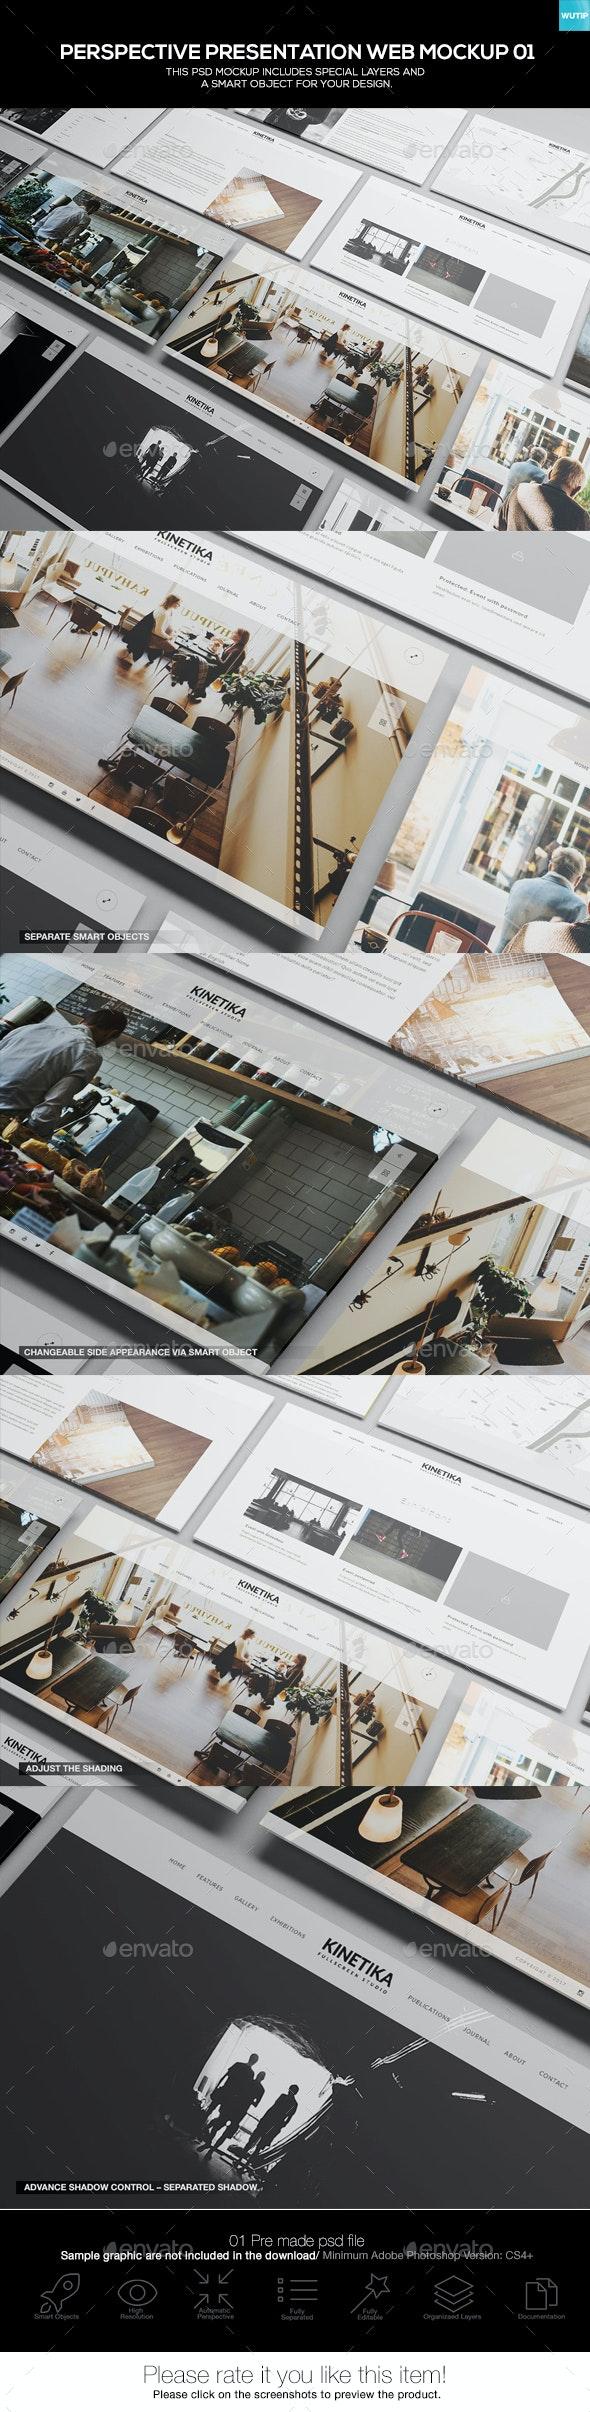 Perspective Presentation Web Mockup 01 - Website Displays